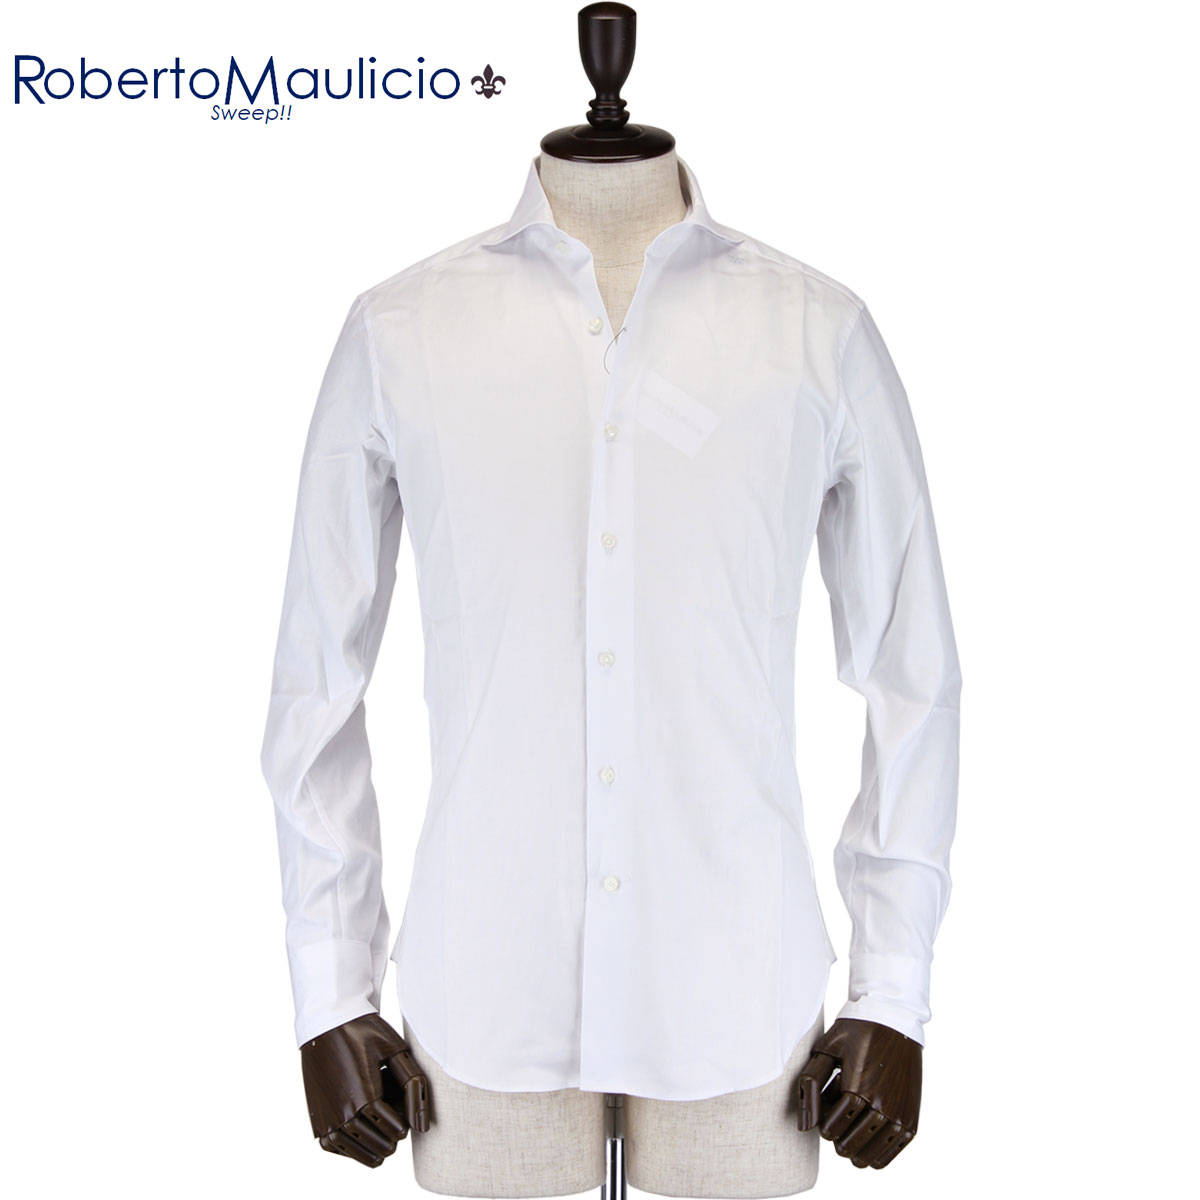 ★BASIC Roberto Maulicio Sweep!! / ROYAL-OXFORD(WHITE)刺繍グレー